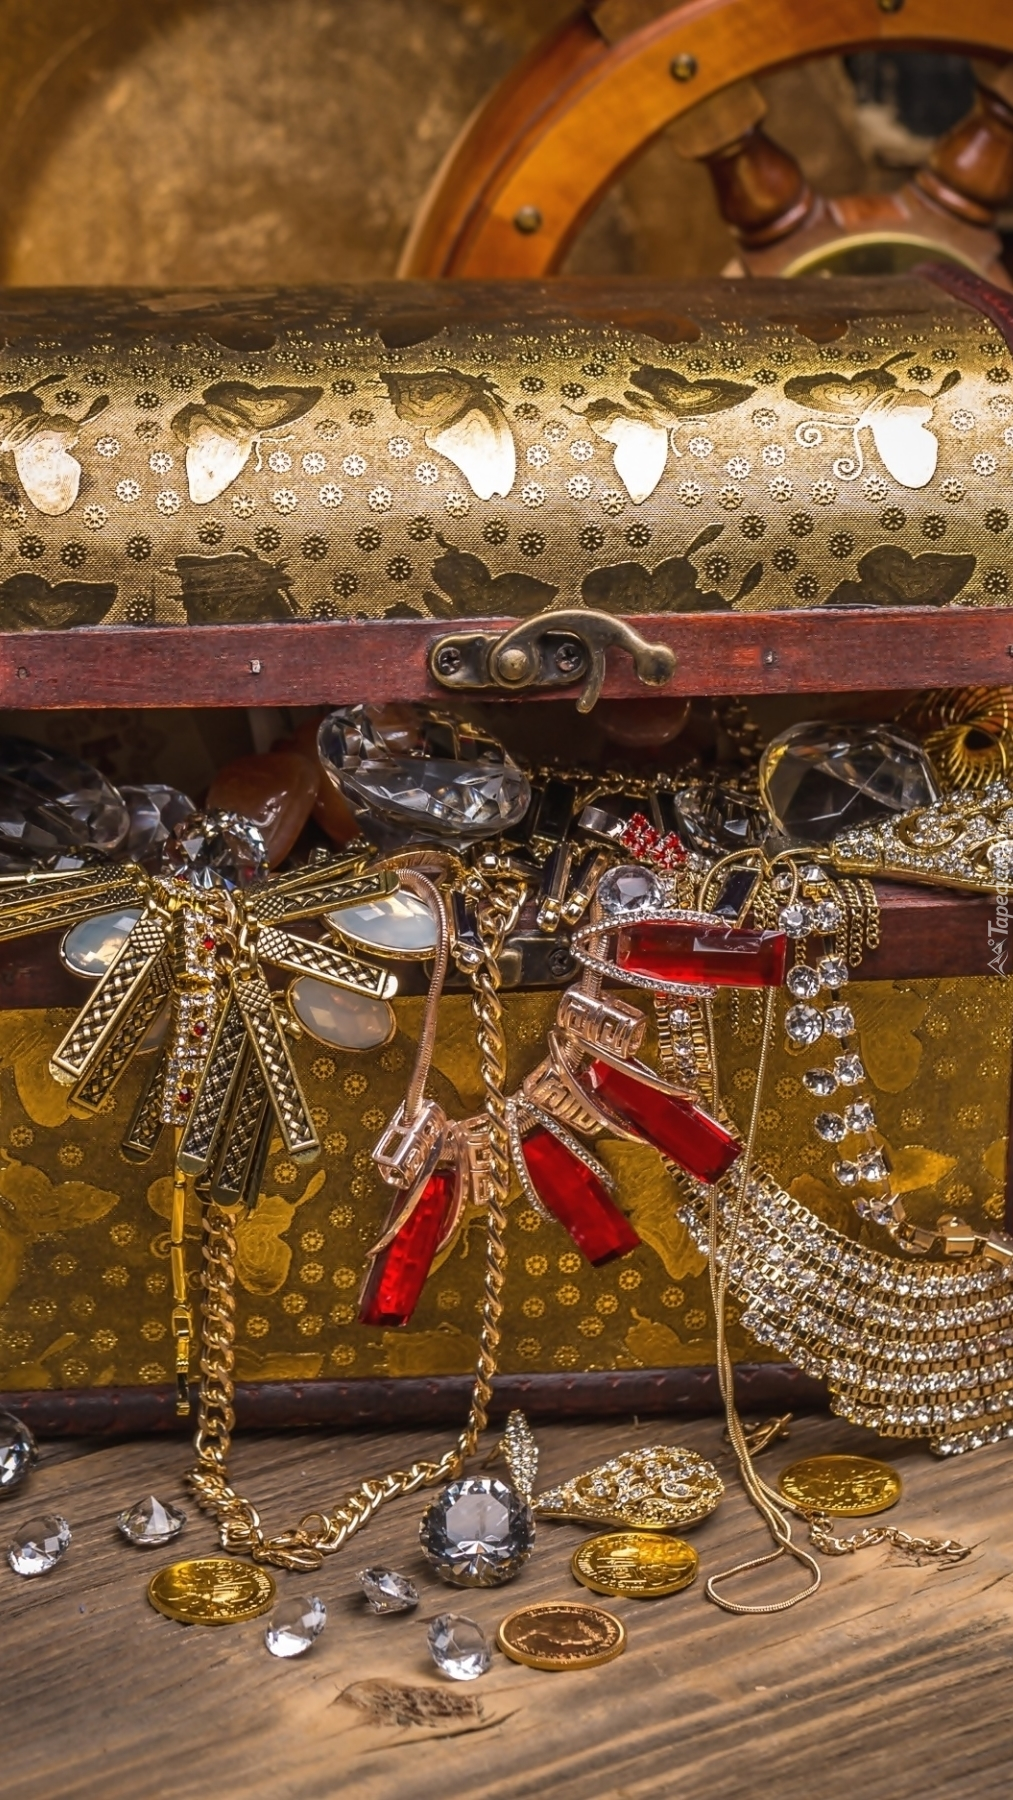 Kuferek z biżuterią